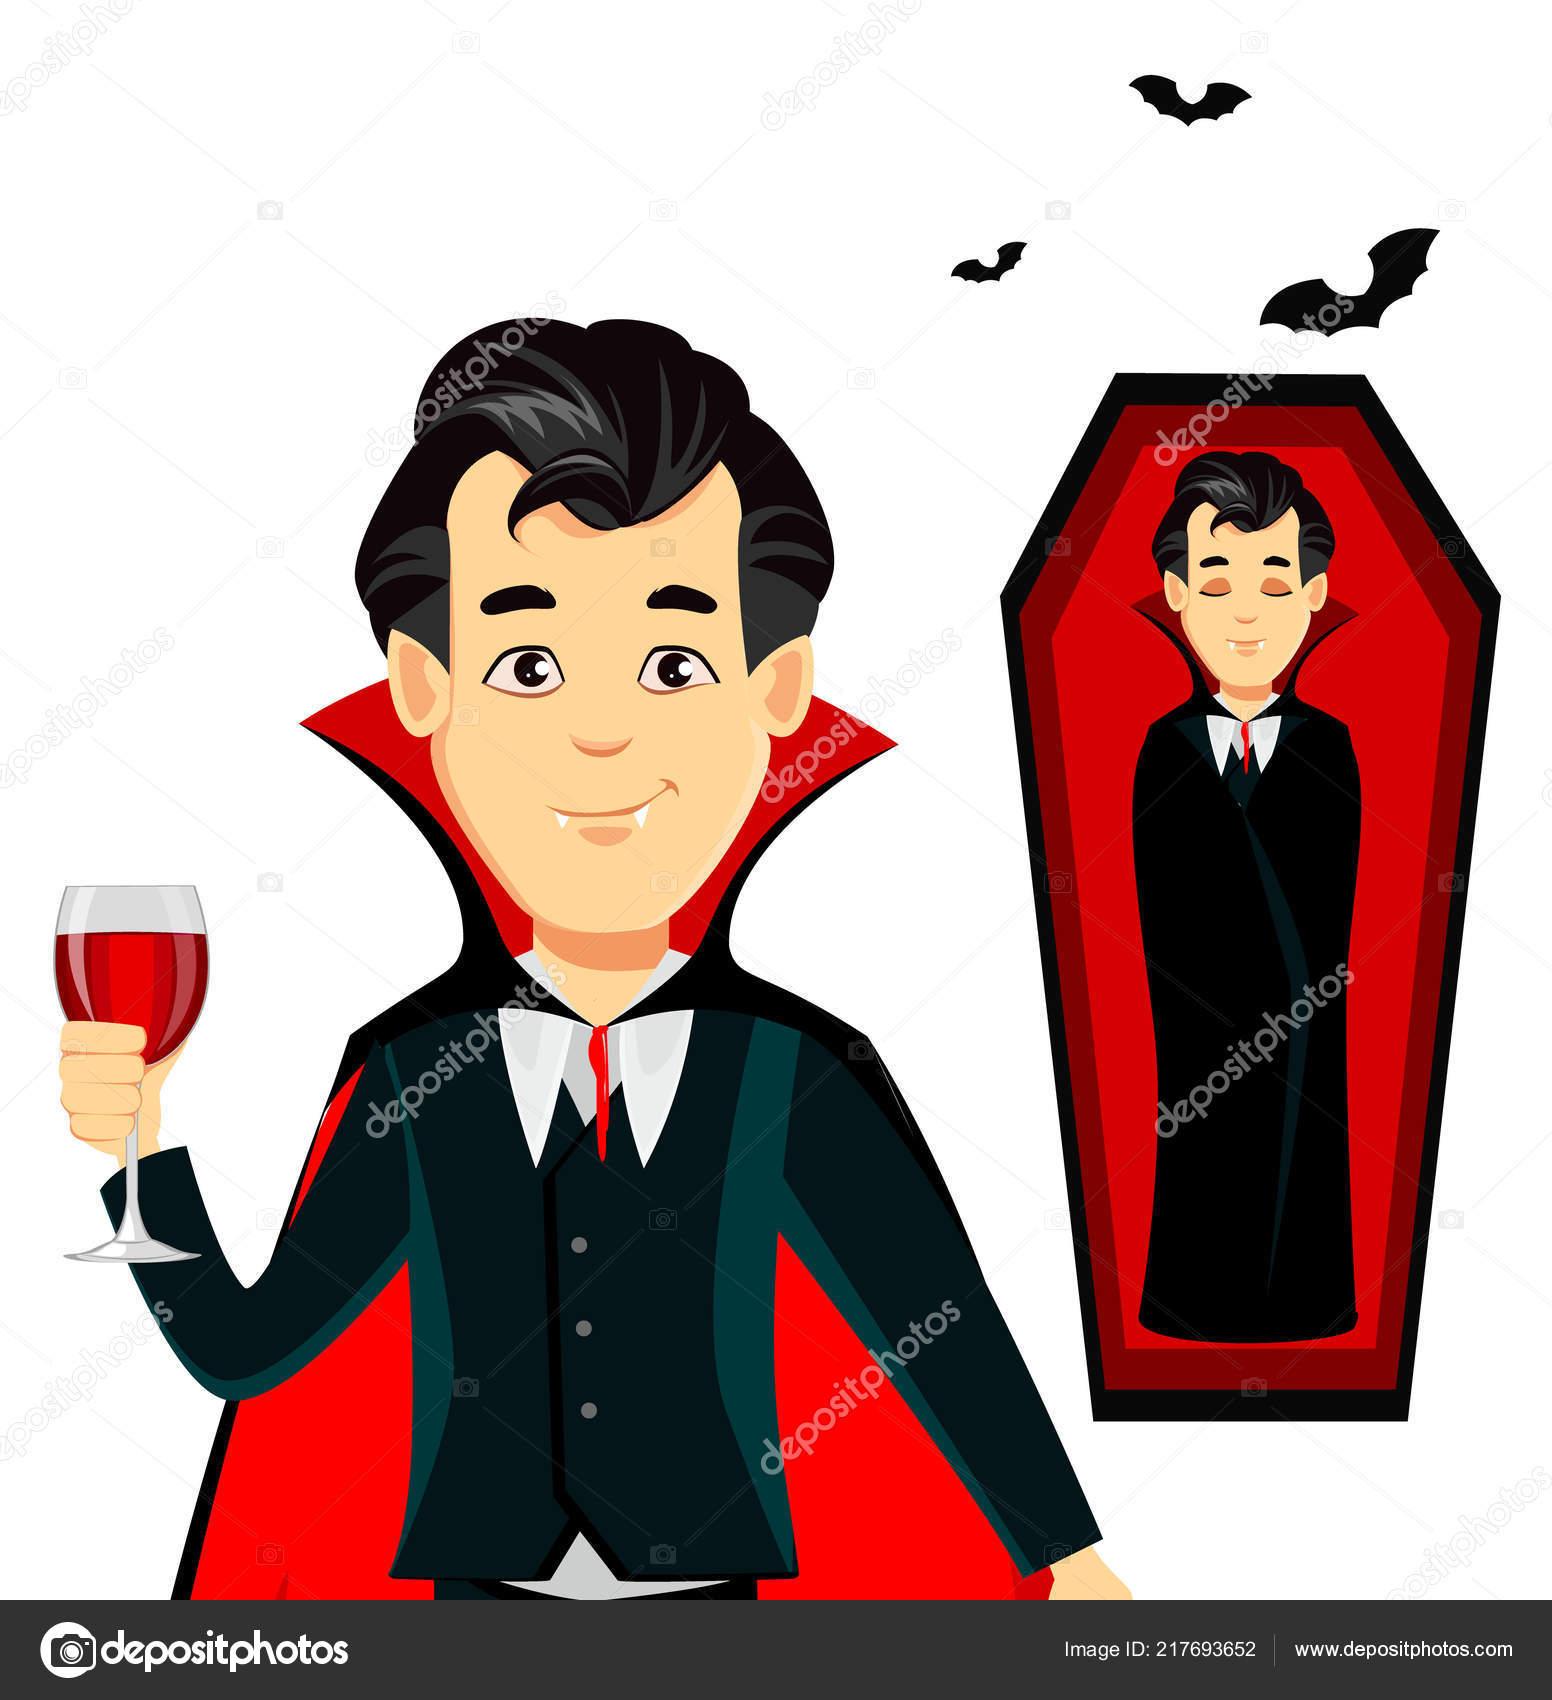 Felice halloween personaggio dei cartoni animati vampiro